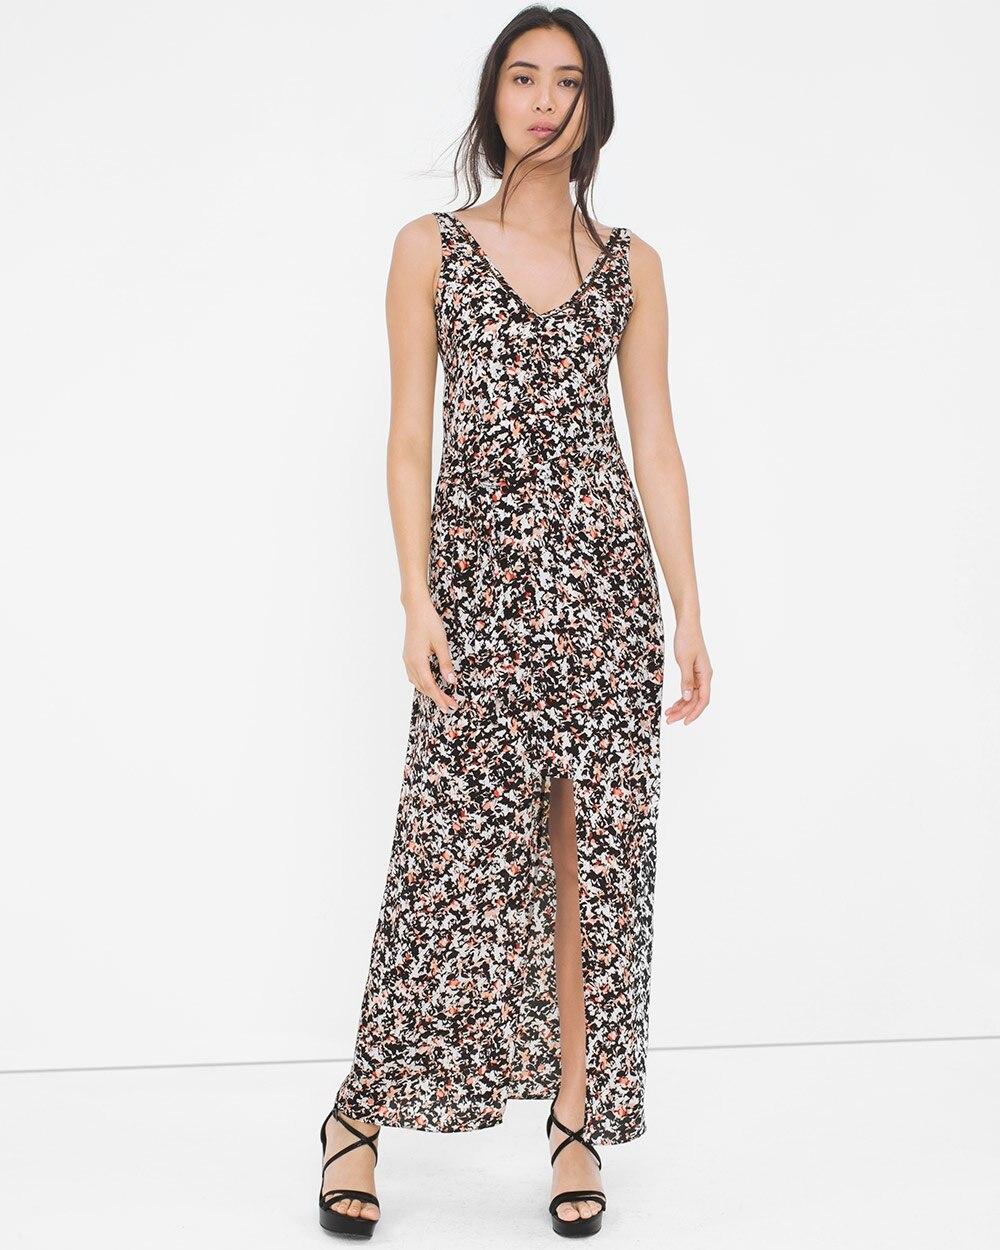 f6e994dc0103e V-Neck Floral Print Maxi Dress - White House Black Market